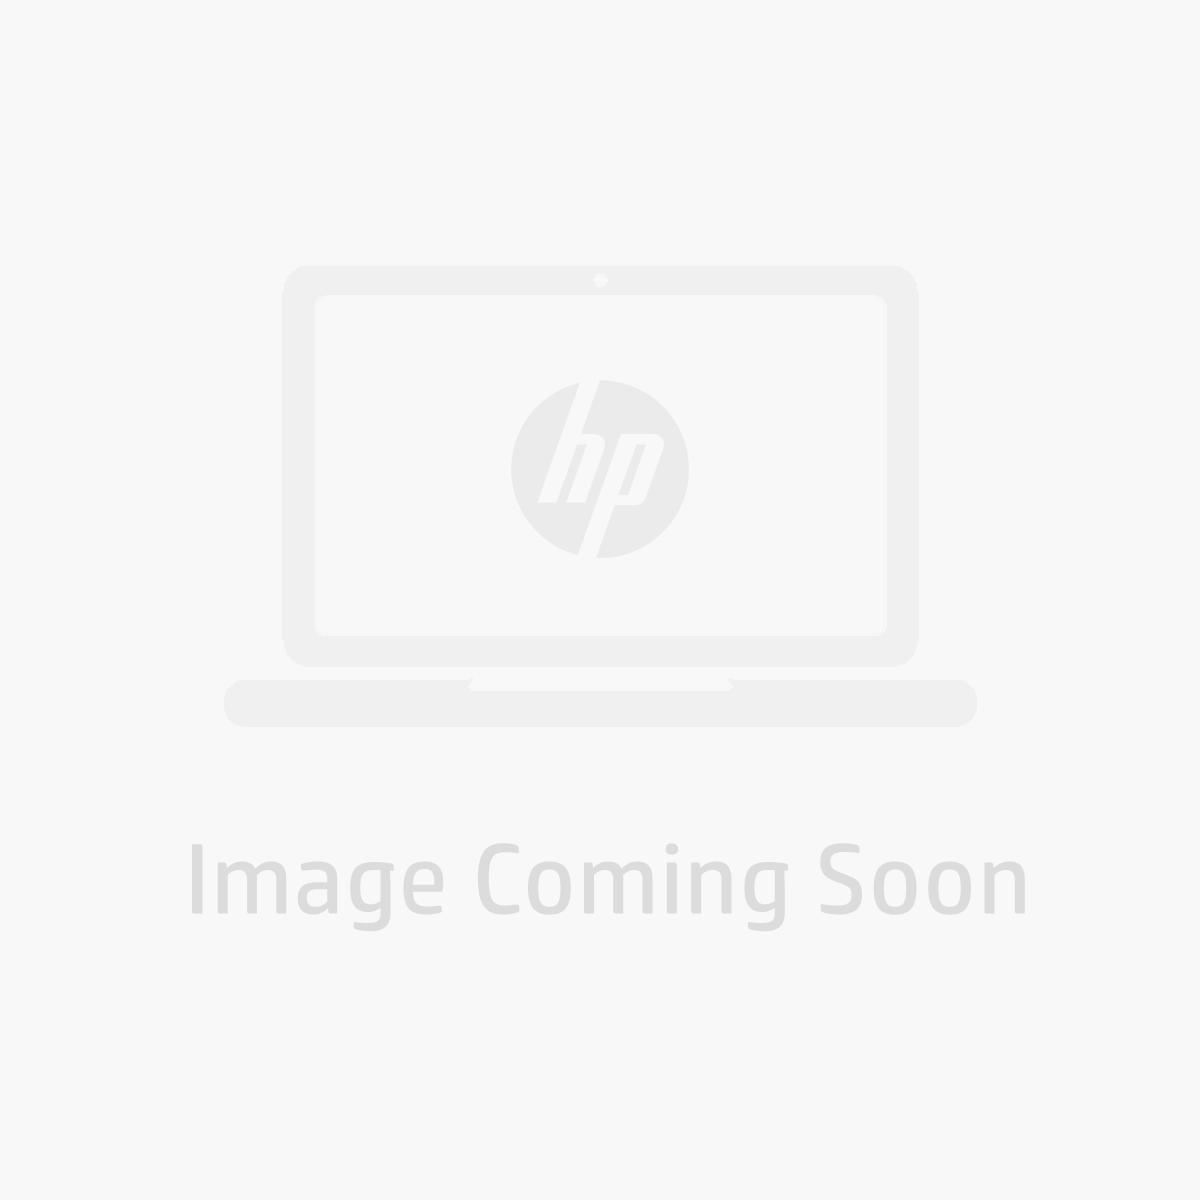 HP Z4000 Black Wireless Mouse